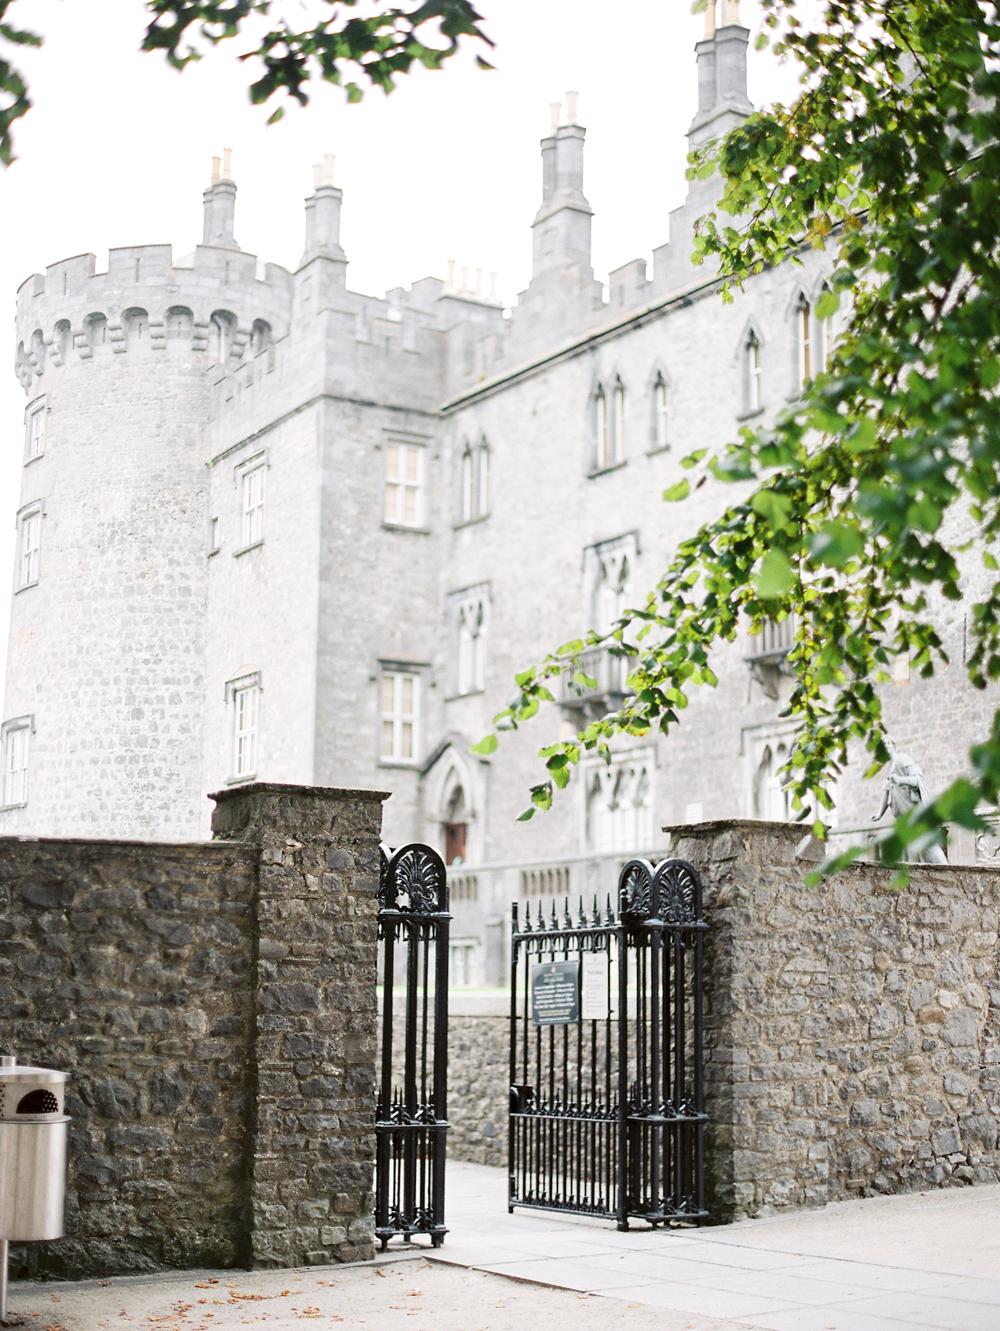 Amanda Nippoldt Photography, Personal Work, Ireland, Travel Photography, Midwest Photographer, Wedding Photographer, Amanda Nippoldt, Kilkenny City, Kilkenny Castle